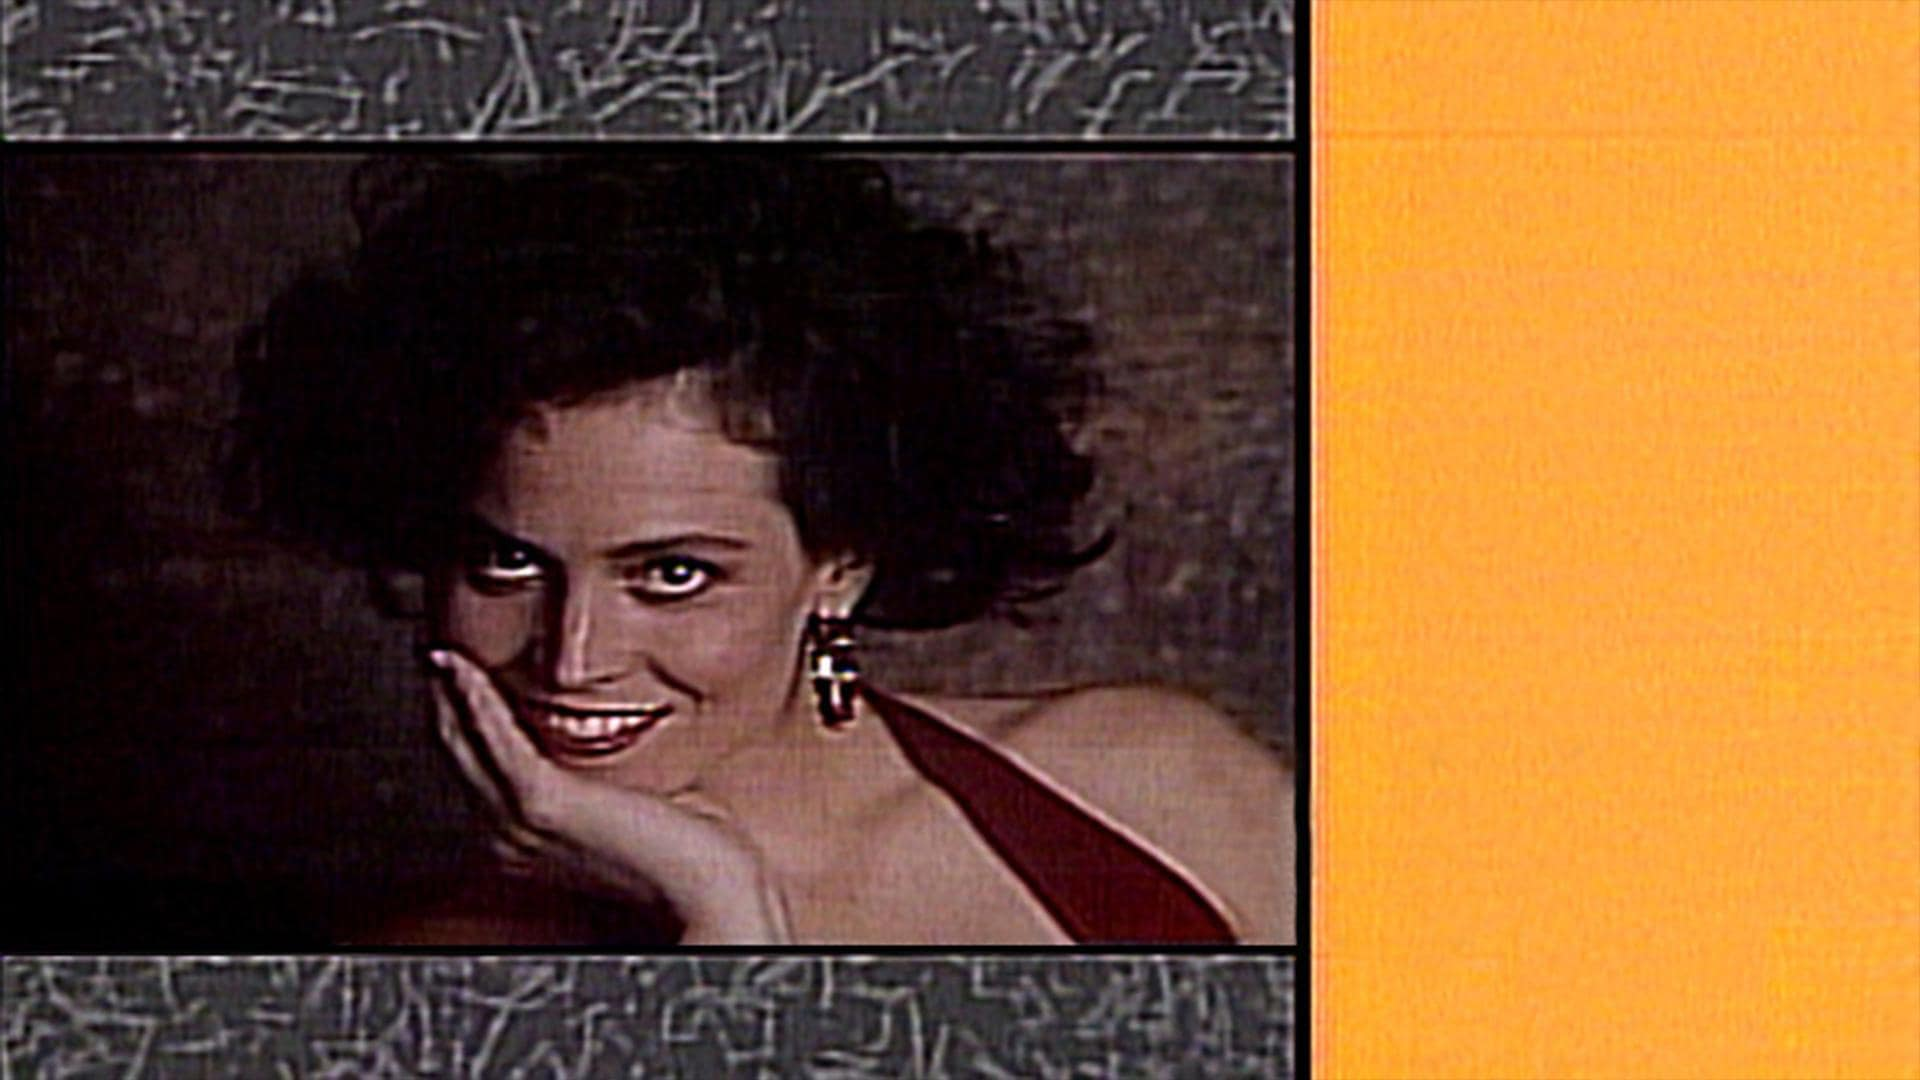 Sigourney Weaver: October 11, 1986